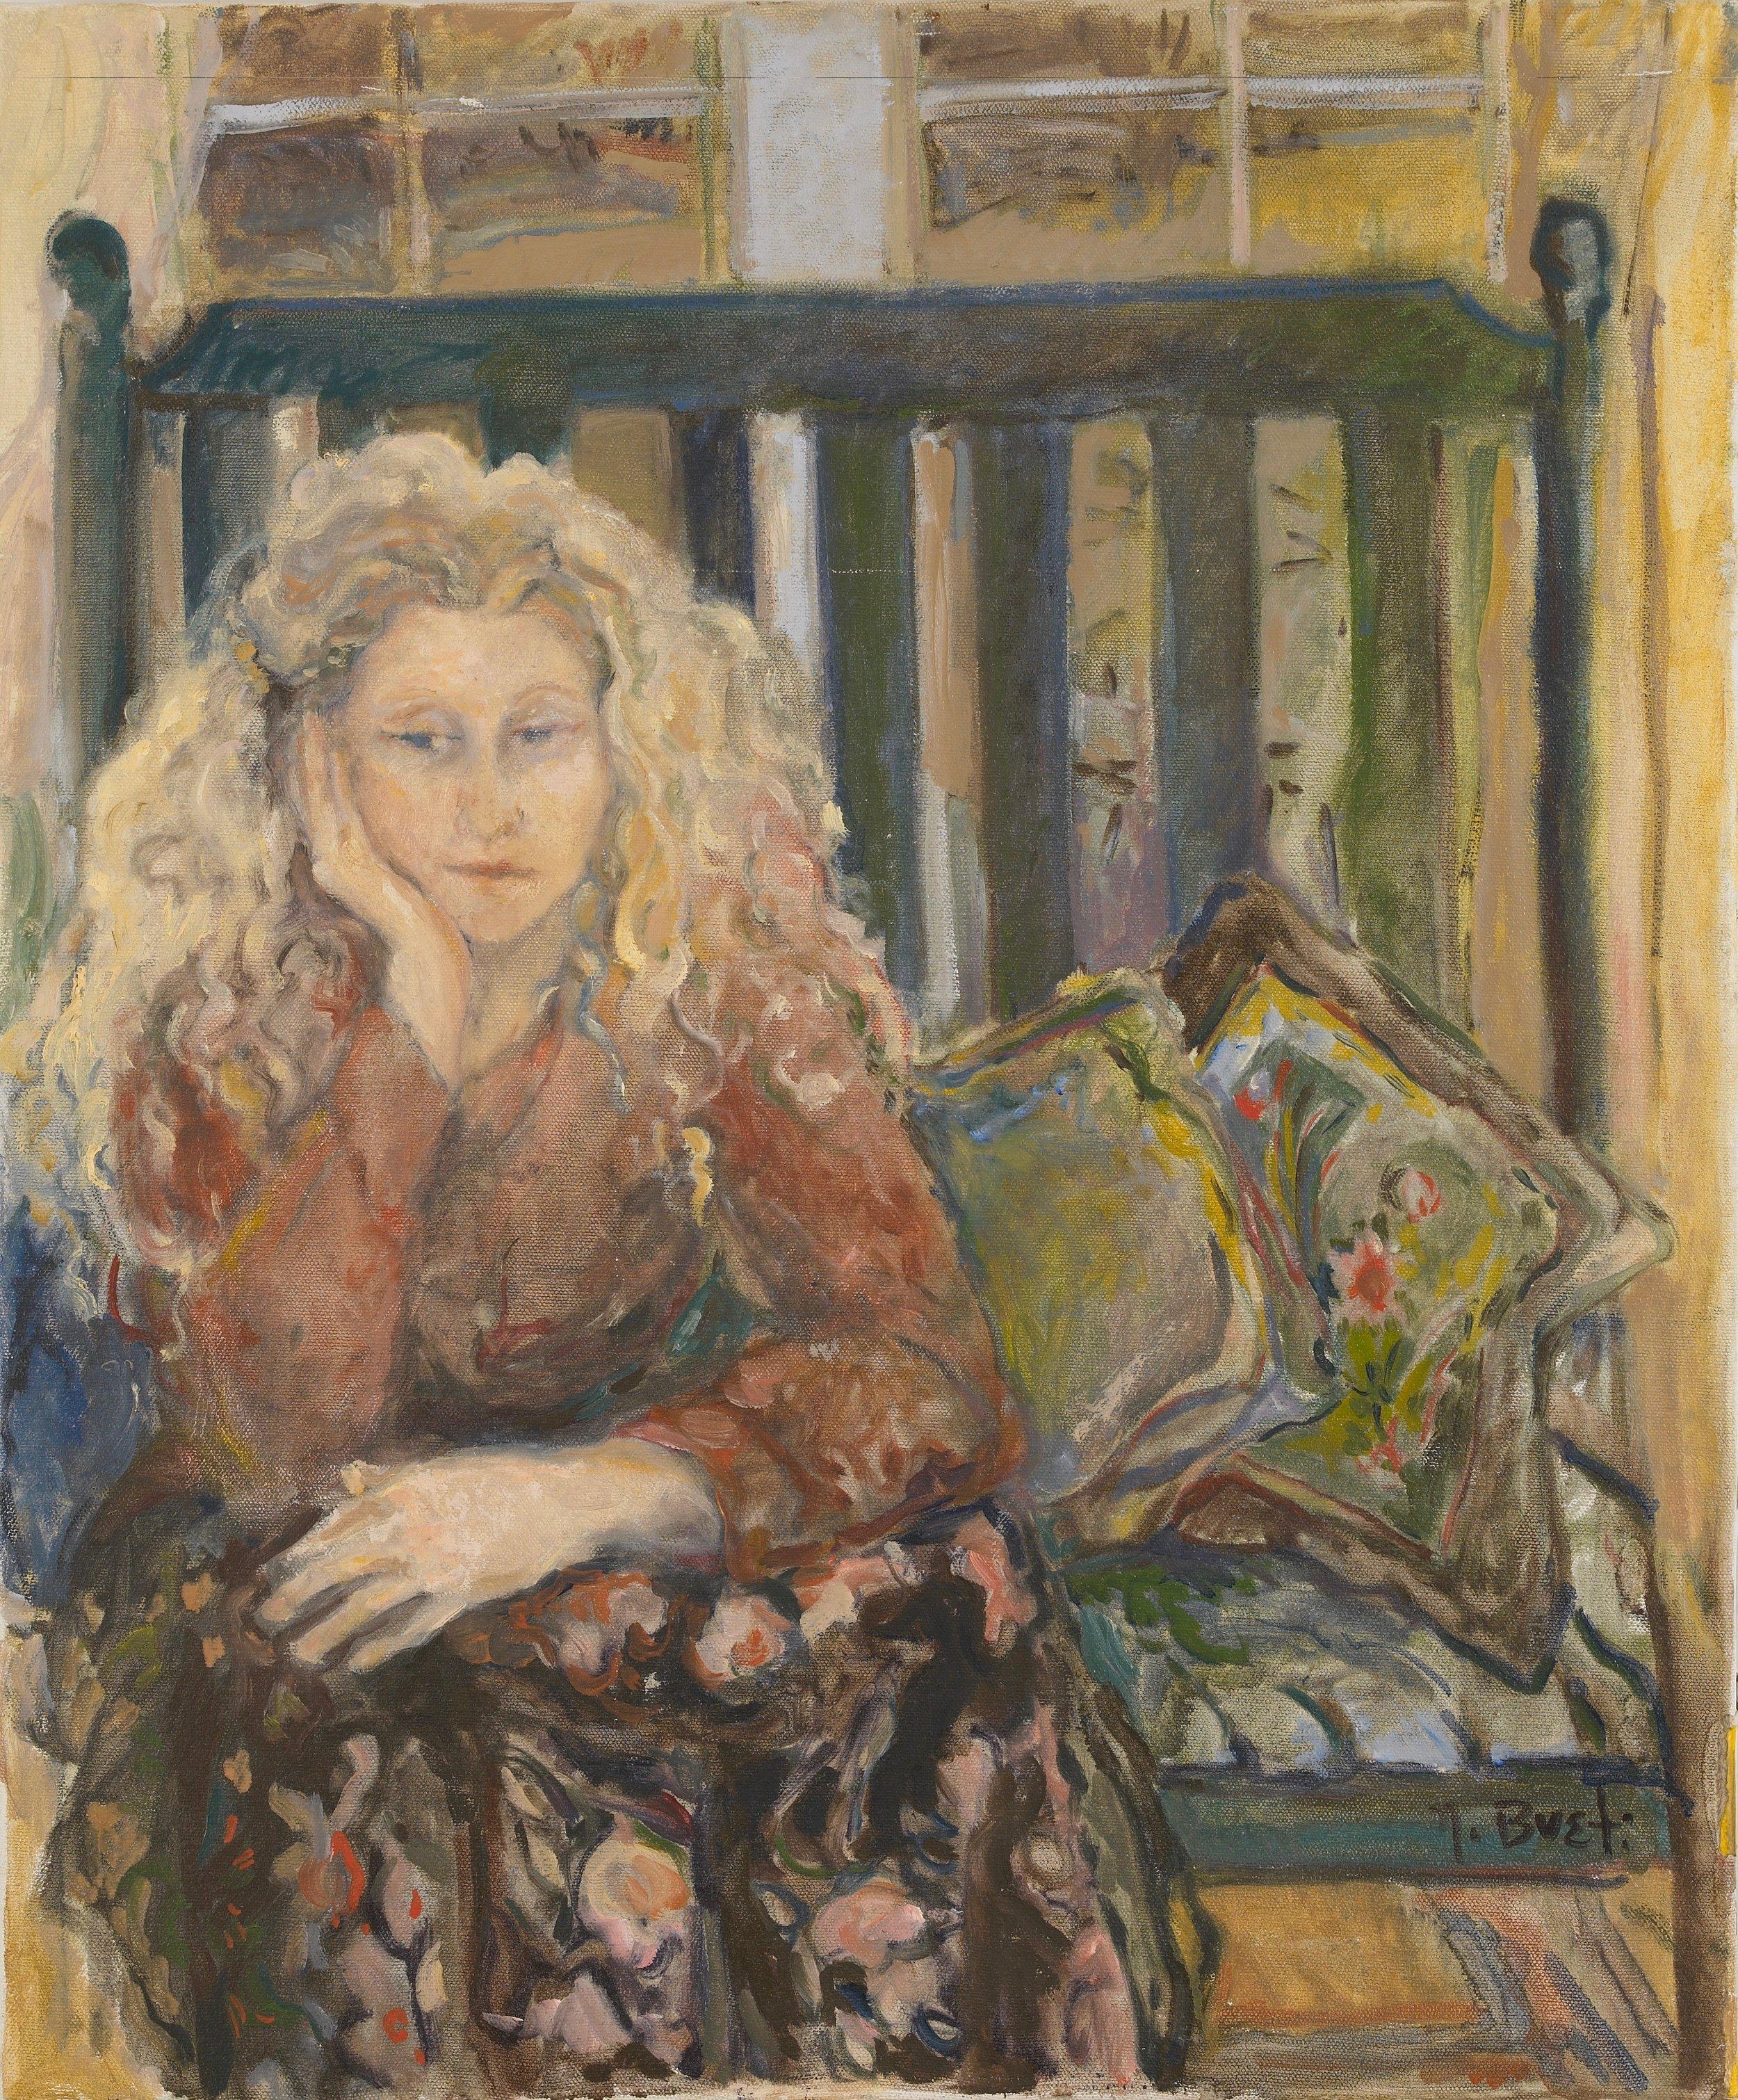 Susan  24X26 - Oil on Canvas